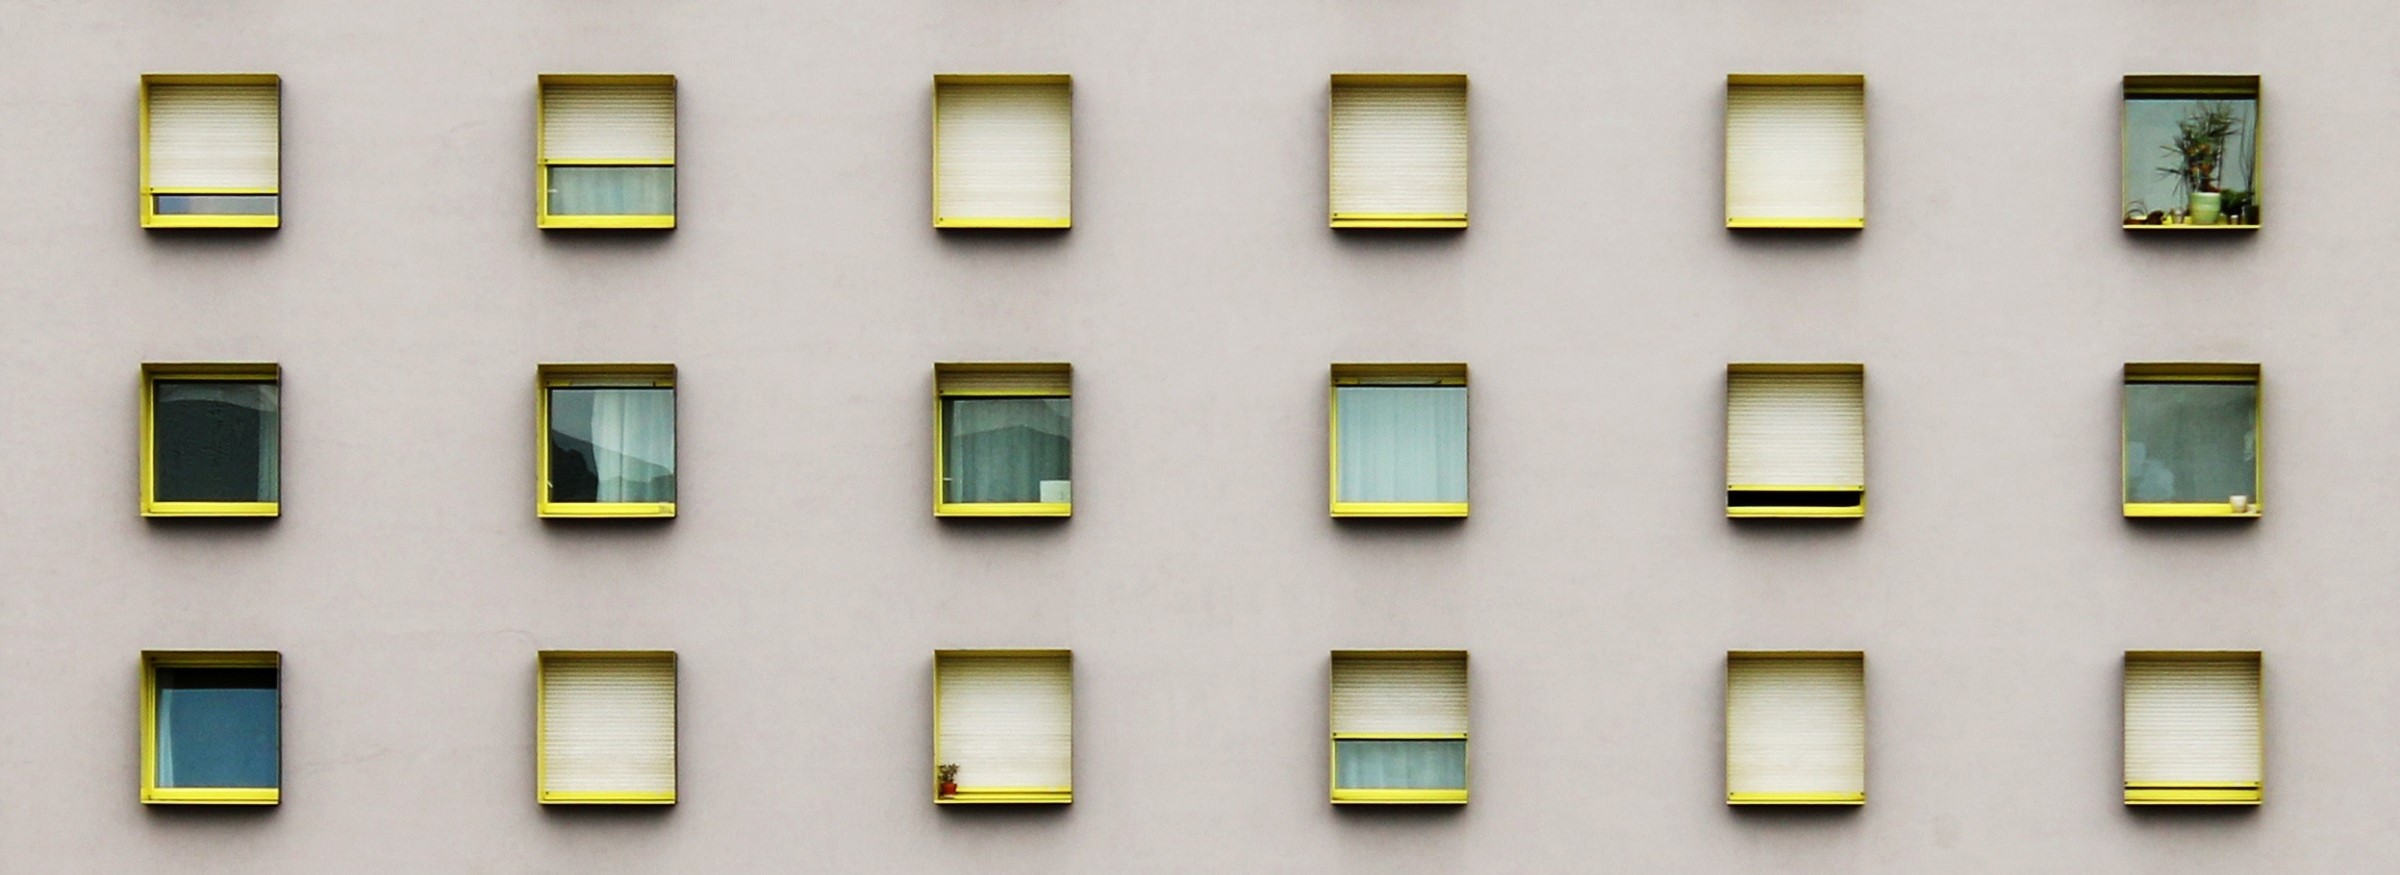 windows-building-pattern-modern_1.jpg